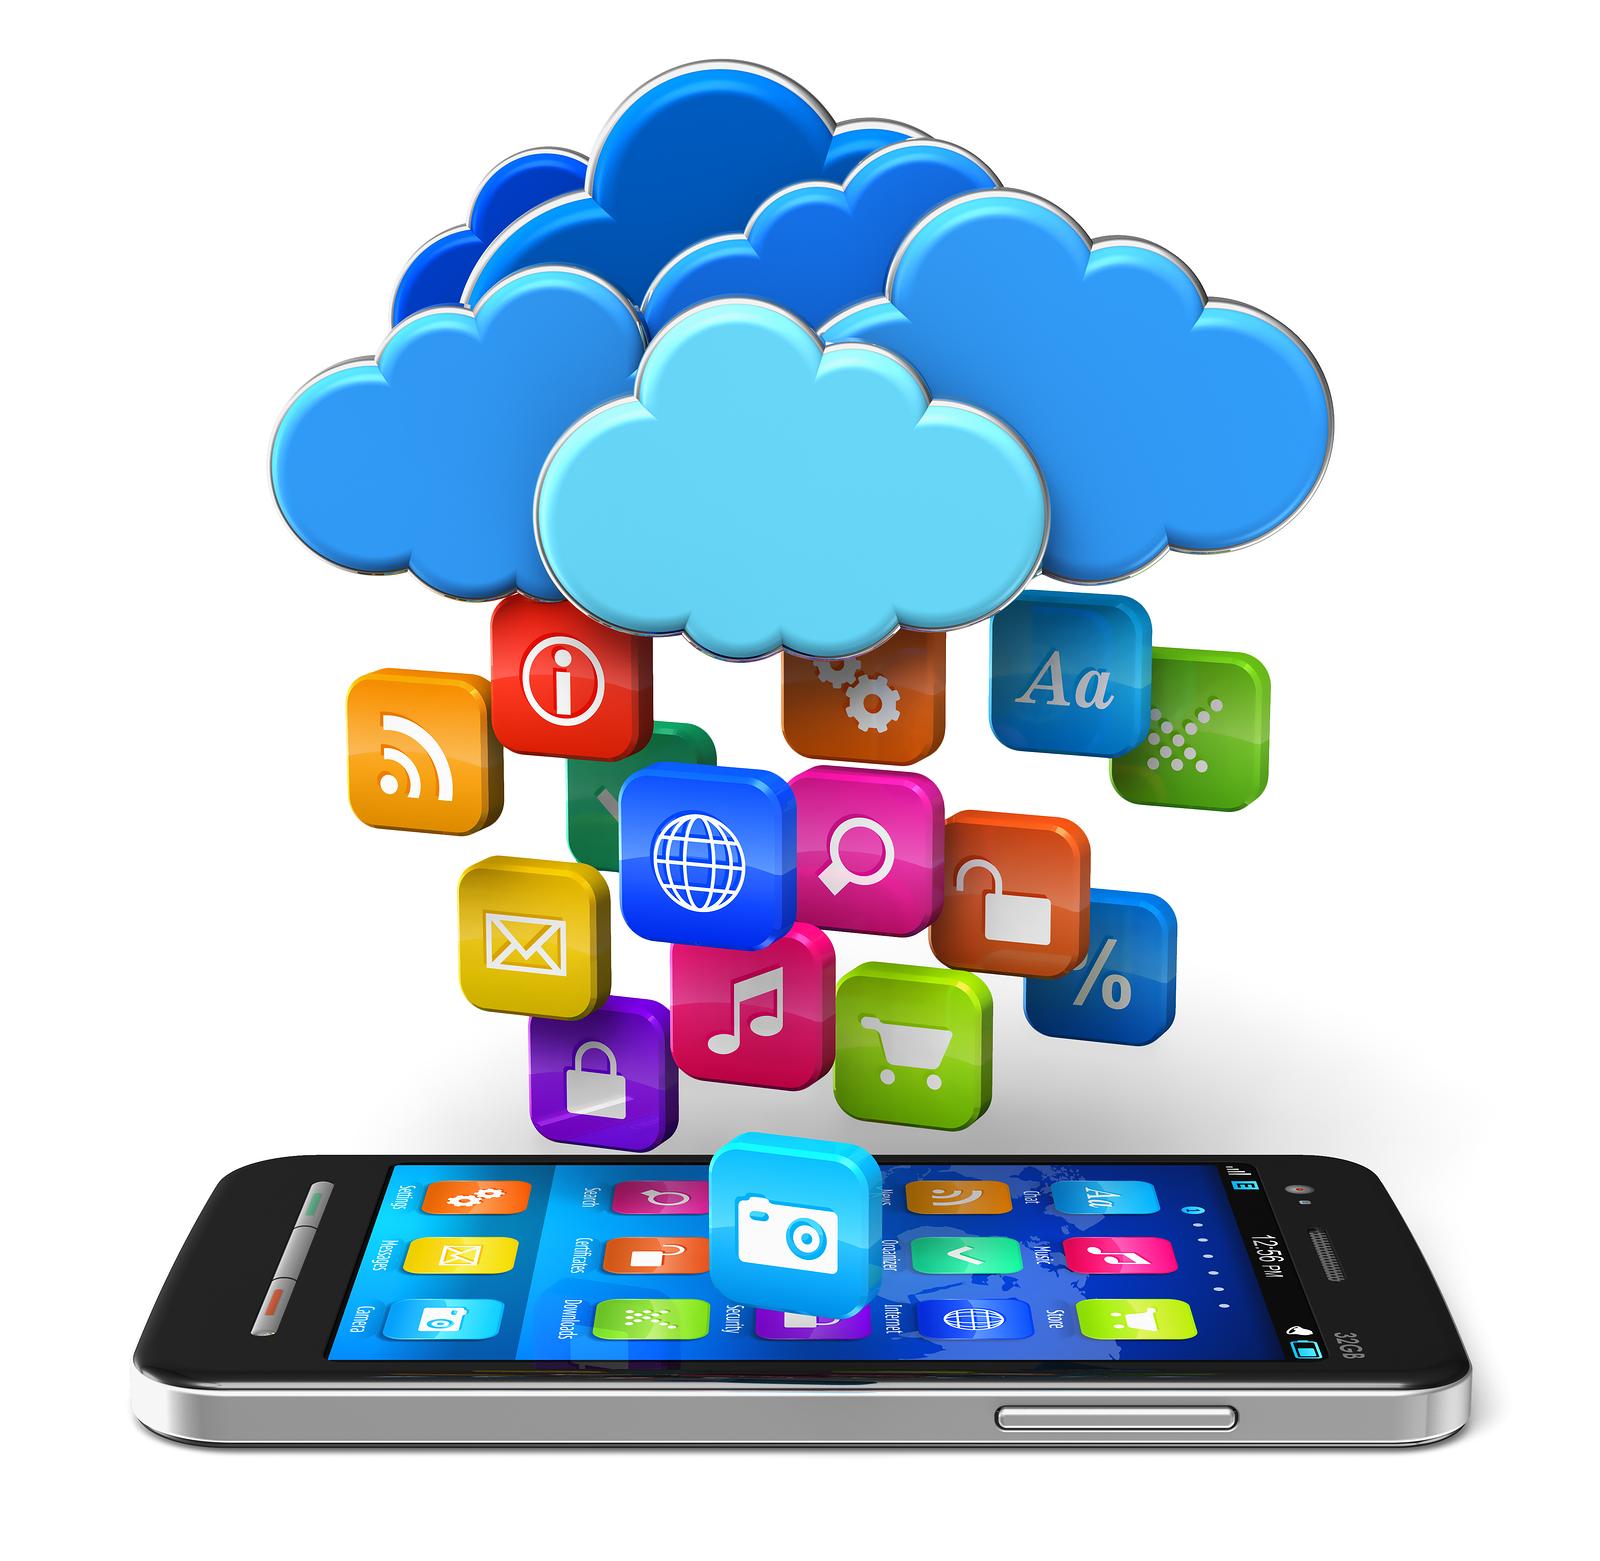 Mobile Cloud Computing A Virtual Pool Of